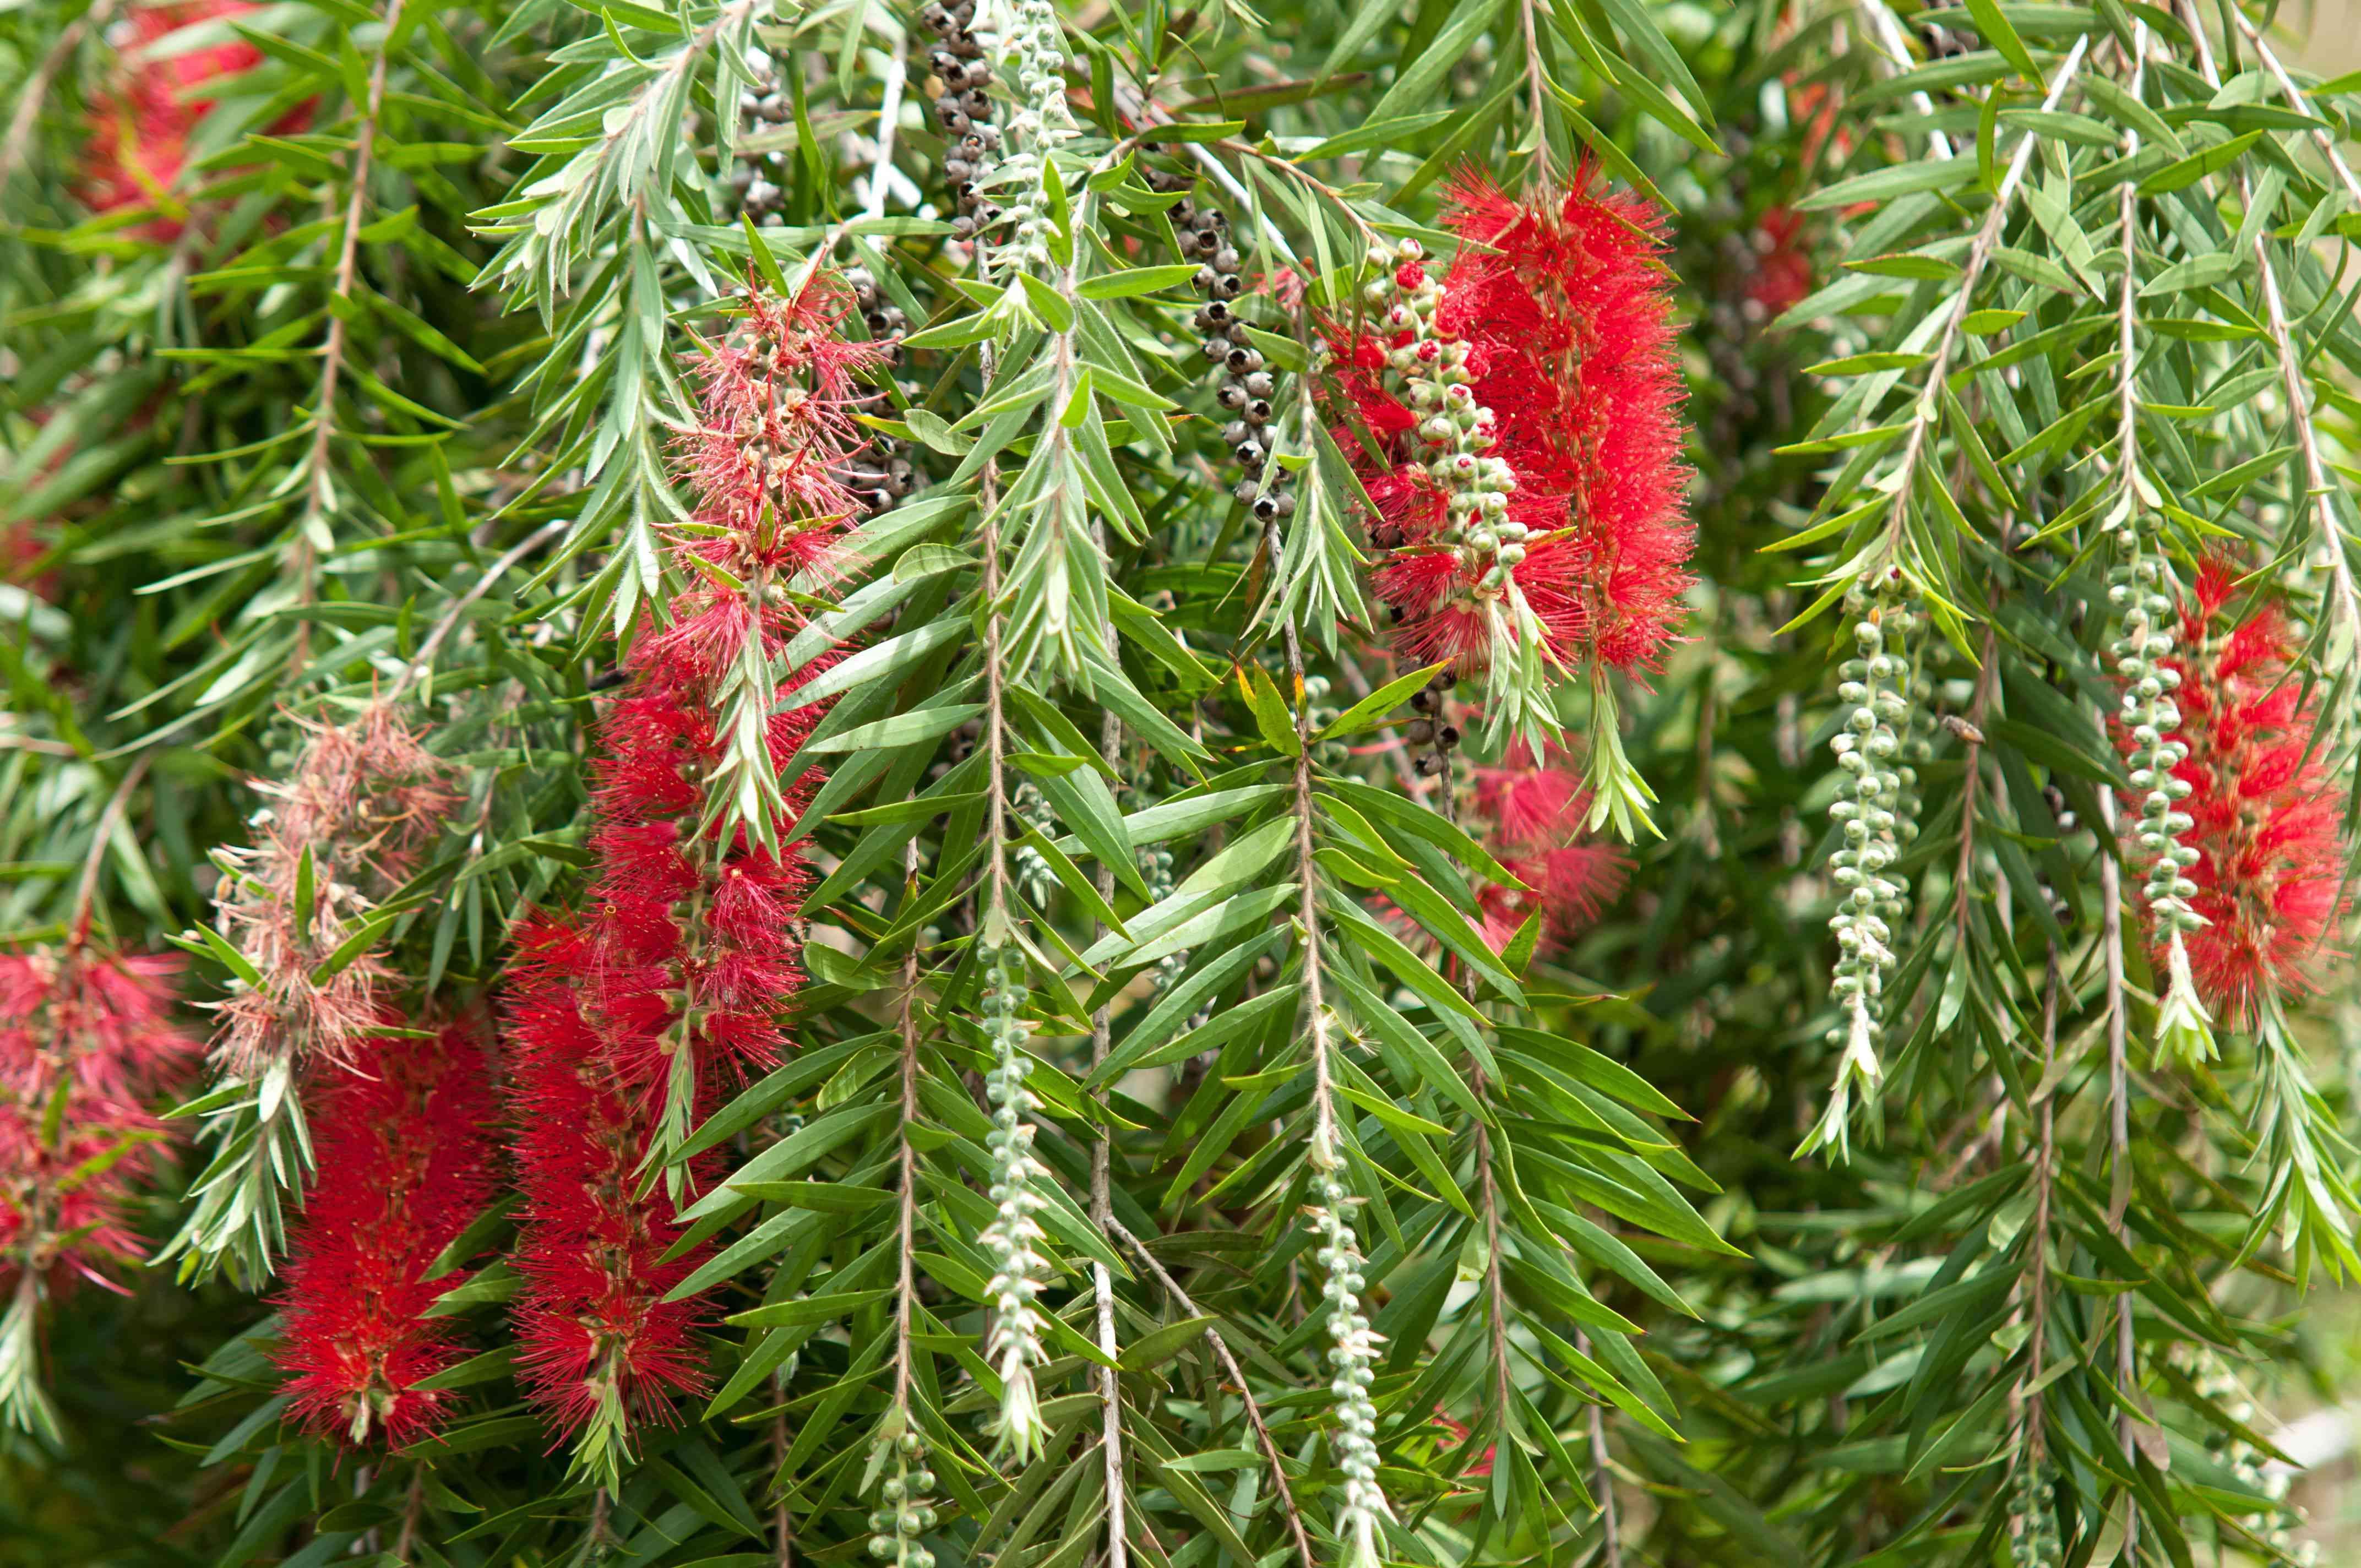 Crimson bottlebrush bush with red bottlebrush-like flowers hanging from branches with short blade-like leaves